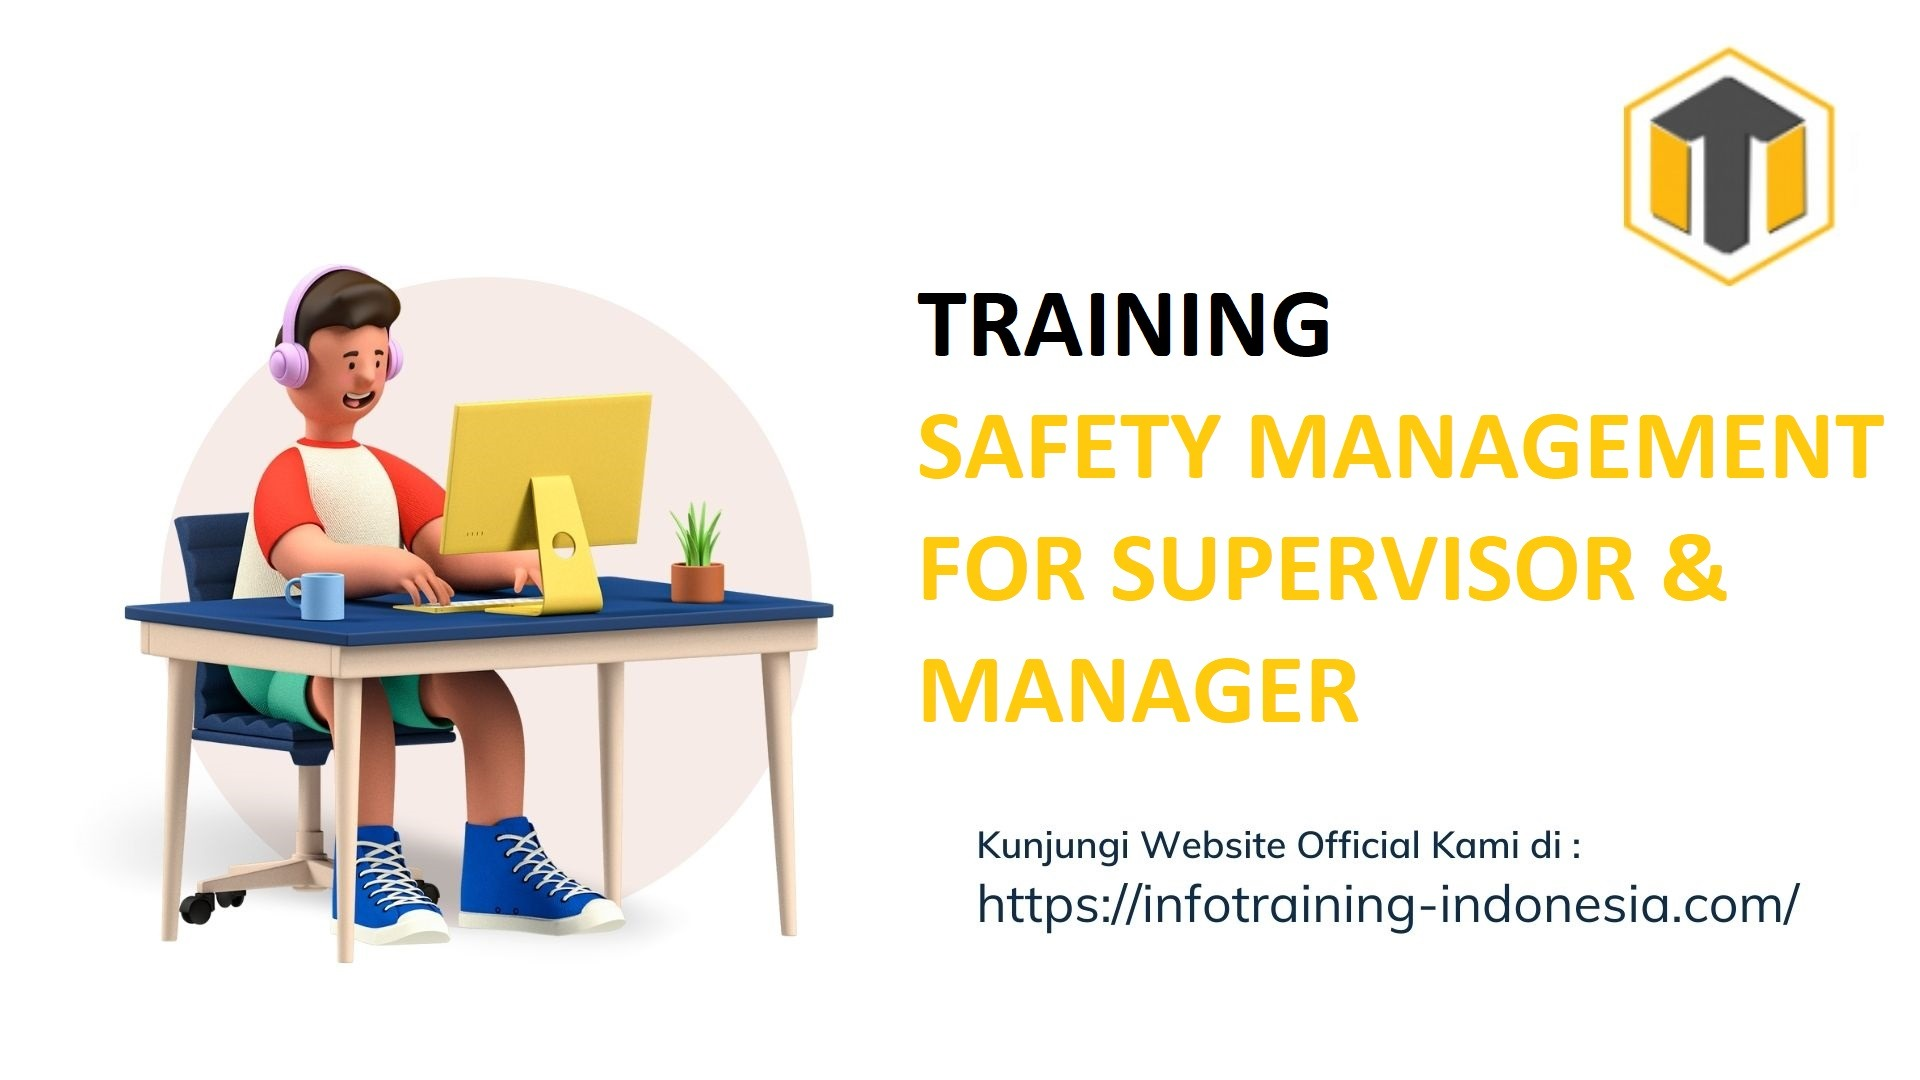 TRAINING SAFETY MANAGEMENT FOR SUPERVISOR MANAGER Manajemen